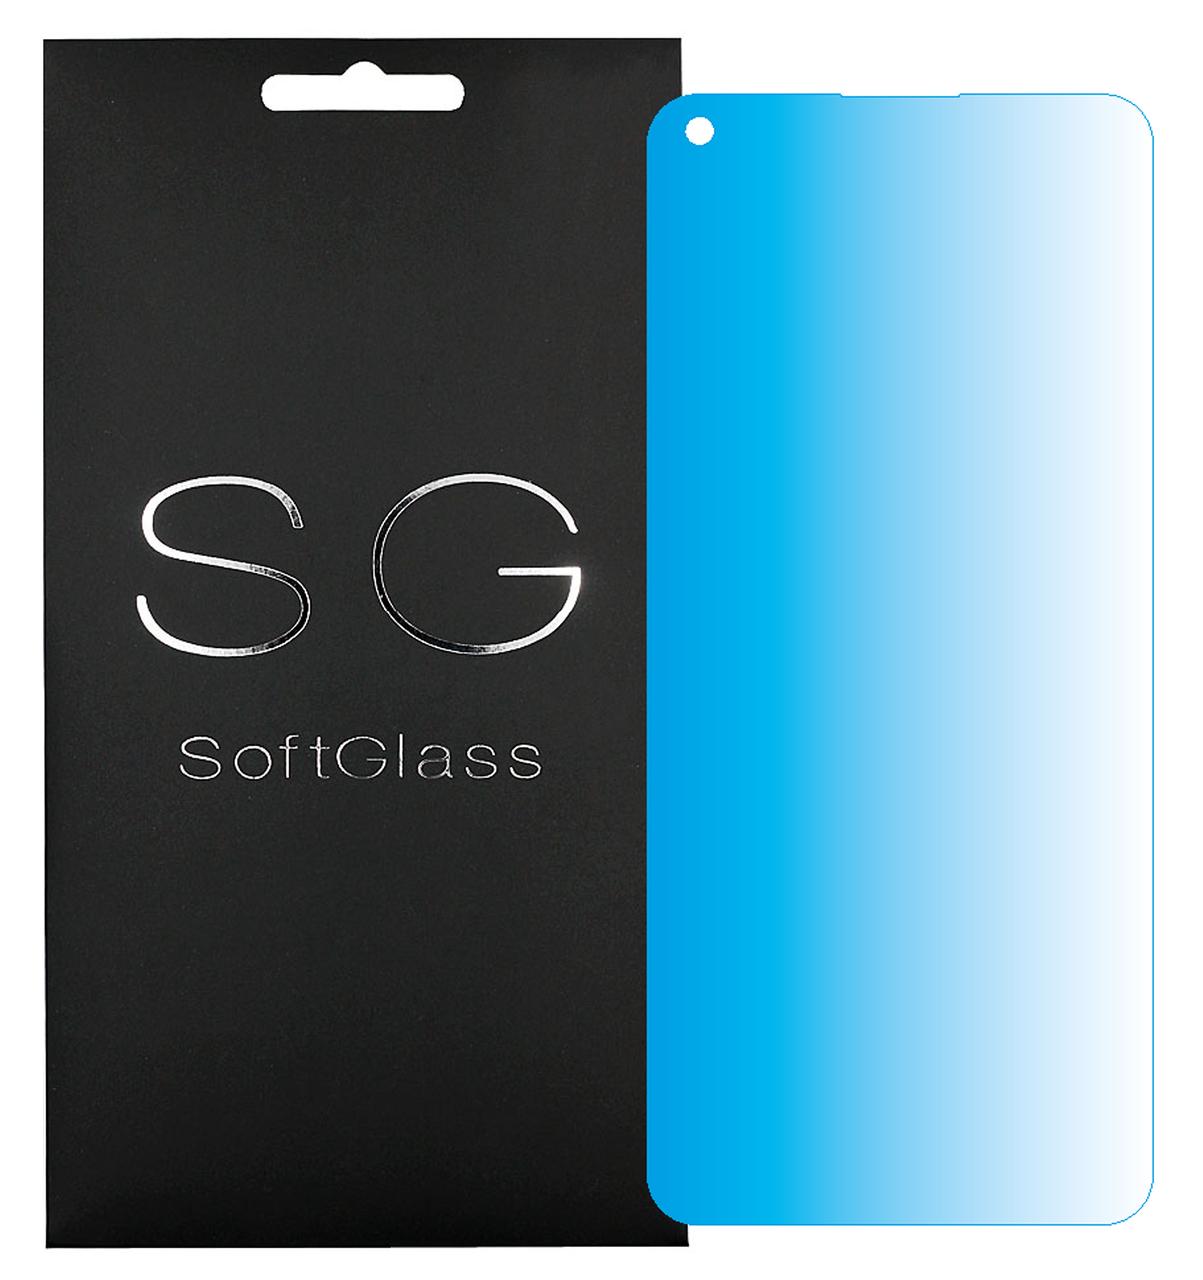 Поліуретанова плівка Realme GT Master SoftGlass